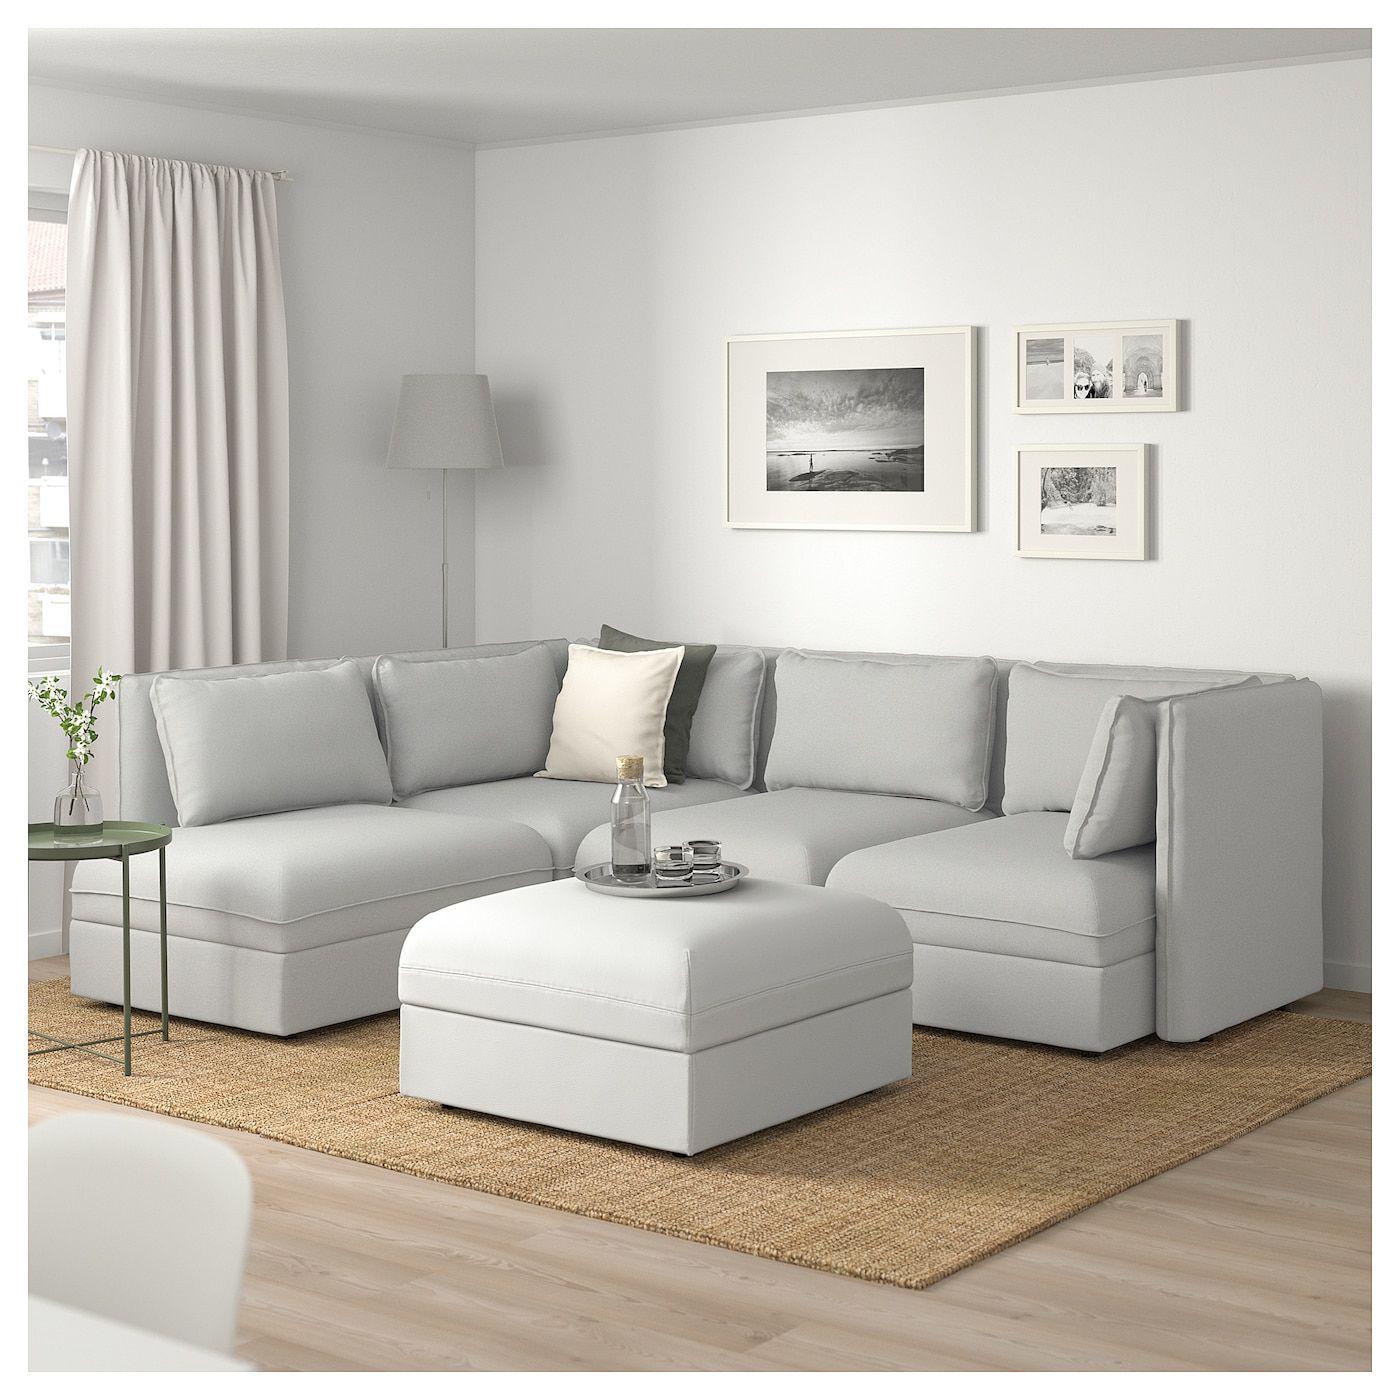 Vallentuna Canape D Angle Modulaire 4 Places Avec Rangement Orrsta Murum Gris Clair Blanc Ikea Modular Corner Sofa Sofa Bed With Storage Vallentuna